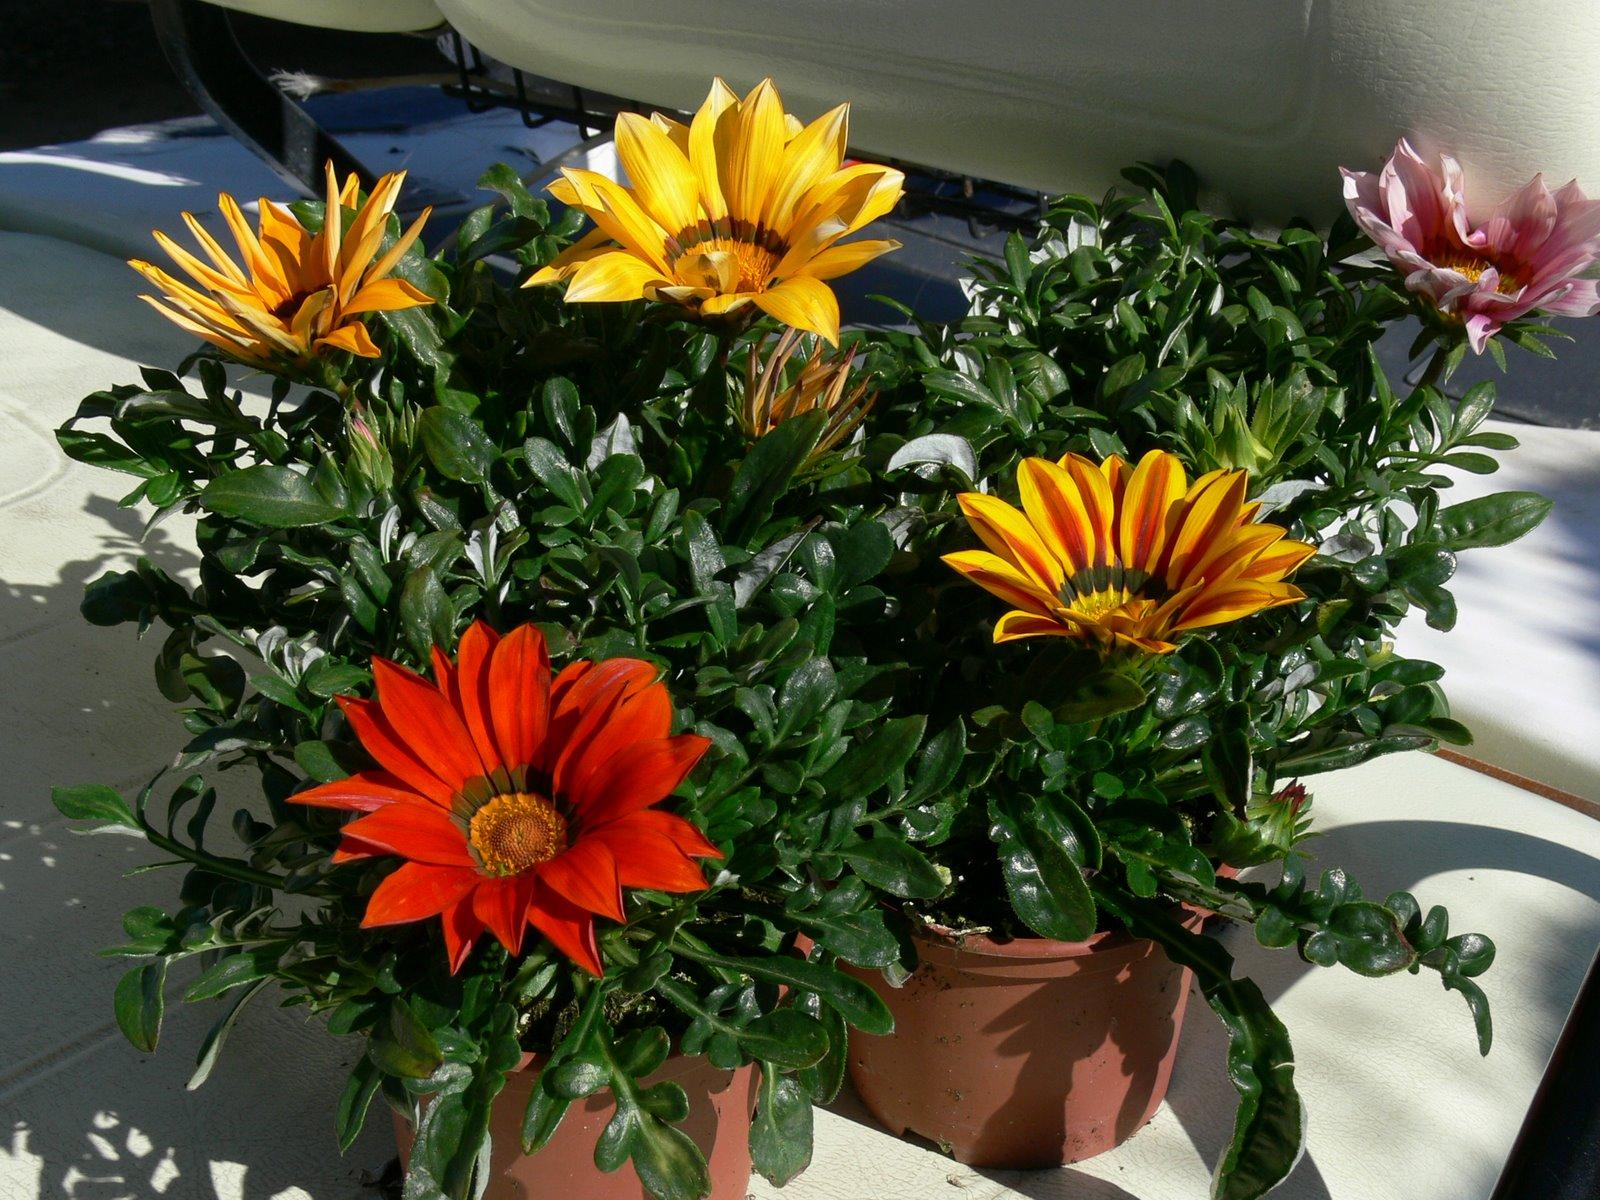 Simplyfiesta ideas f ciles para peque as fiestas - Plantas para terrazas ...